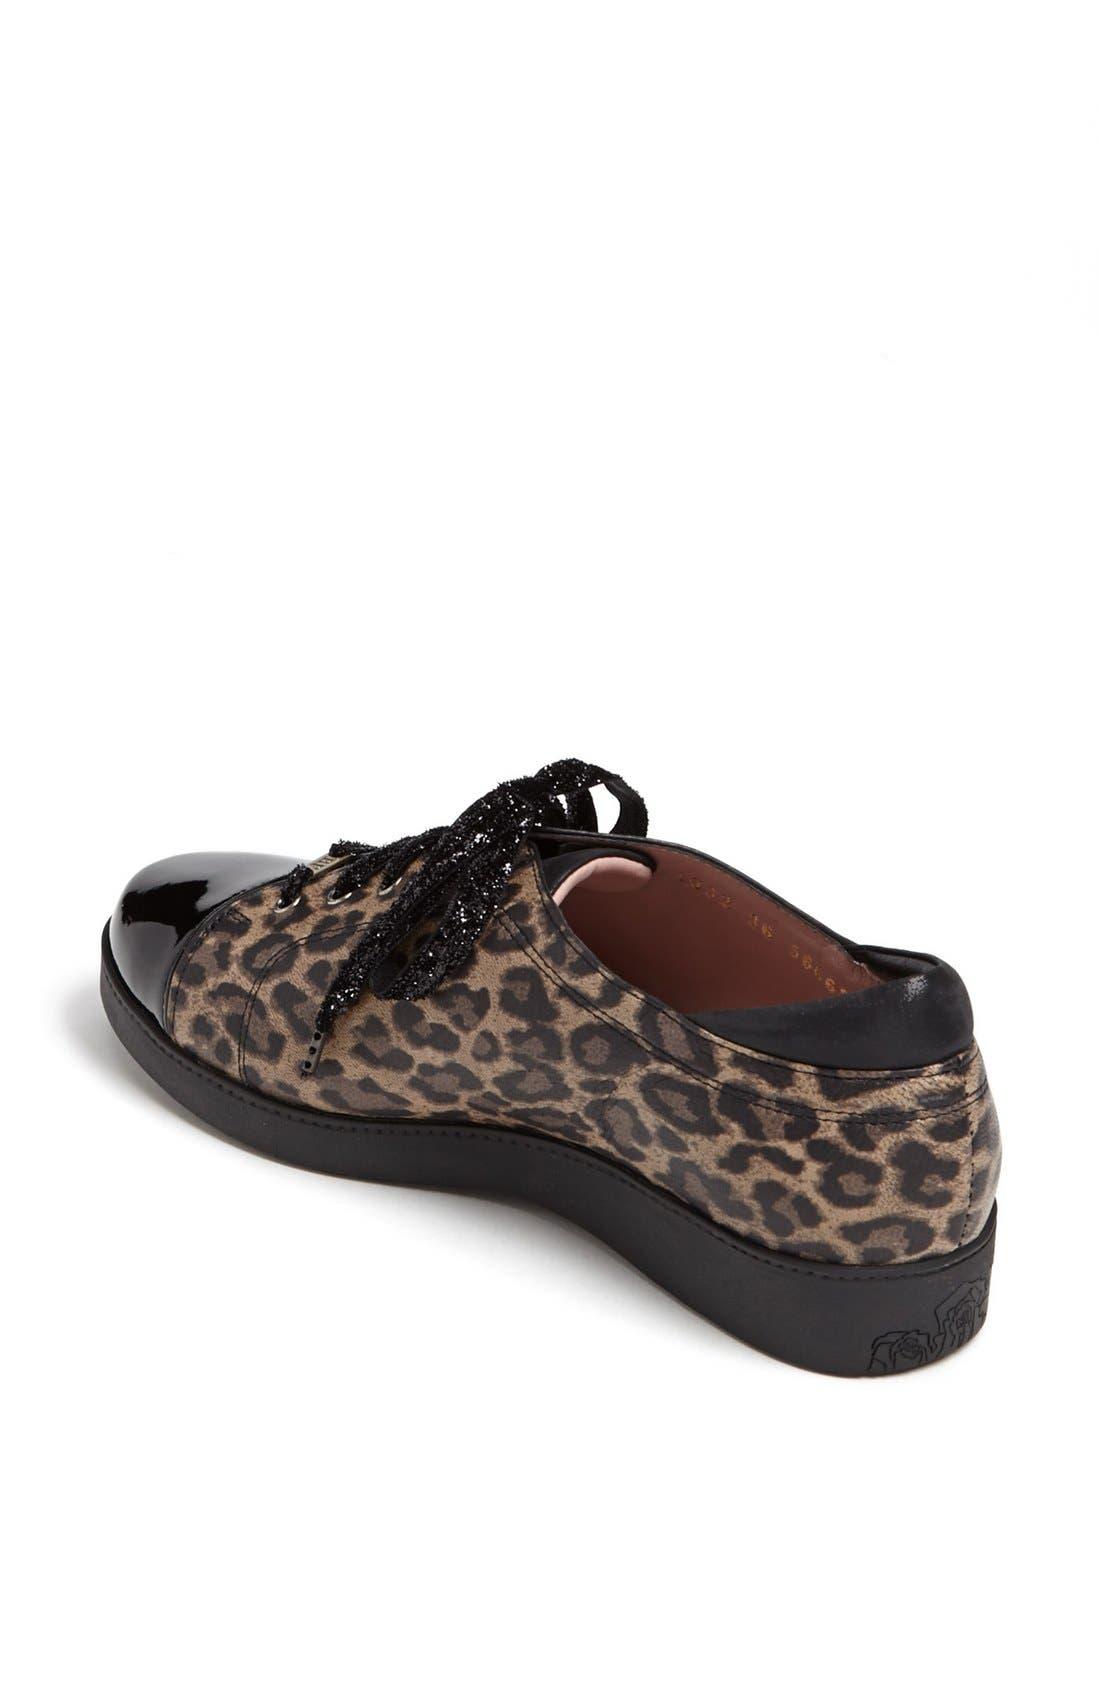 'Aria' Sneaker,                             Alternate thumbnail 2, color,                             Leopard Print Leather